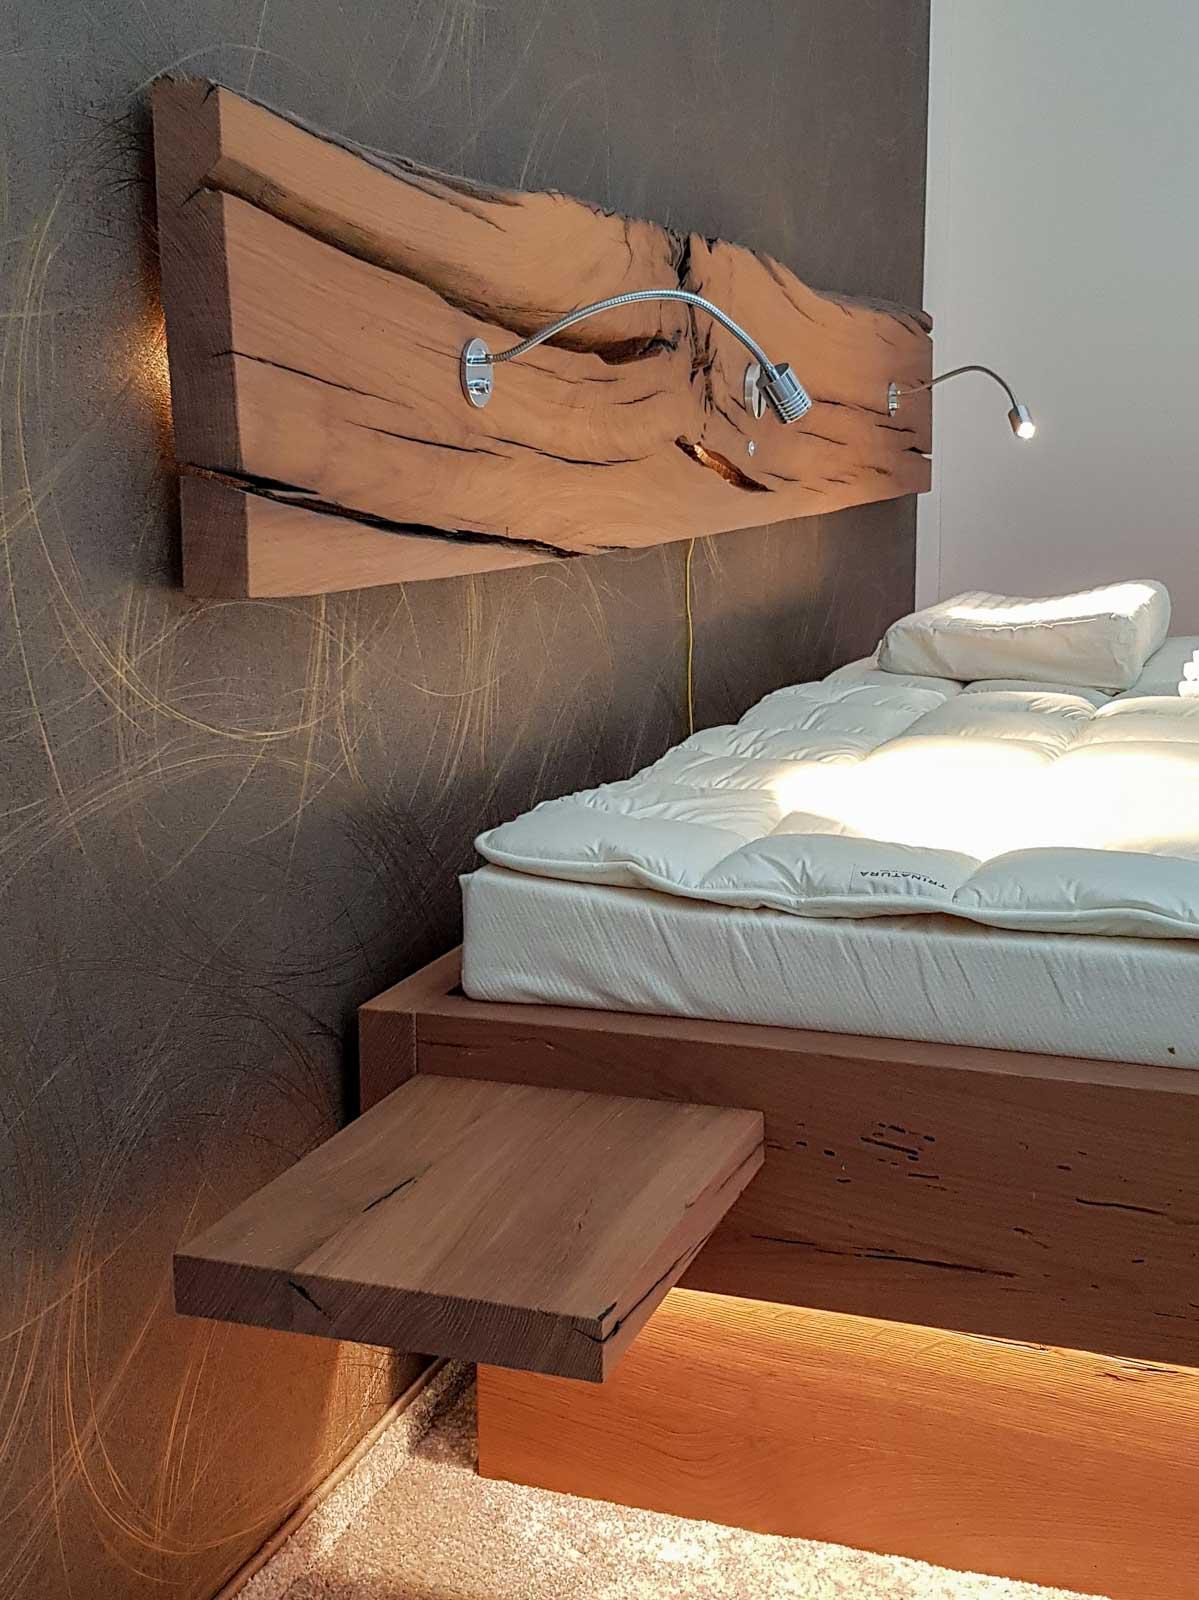 Wooddesign_Bett_Trinatura_Altholz_Eiche_Beleuchtung_indirekte Beleuchtung_Schublade (2)